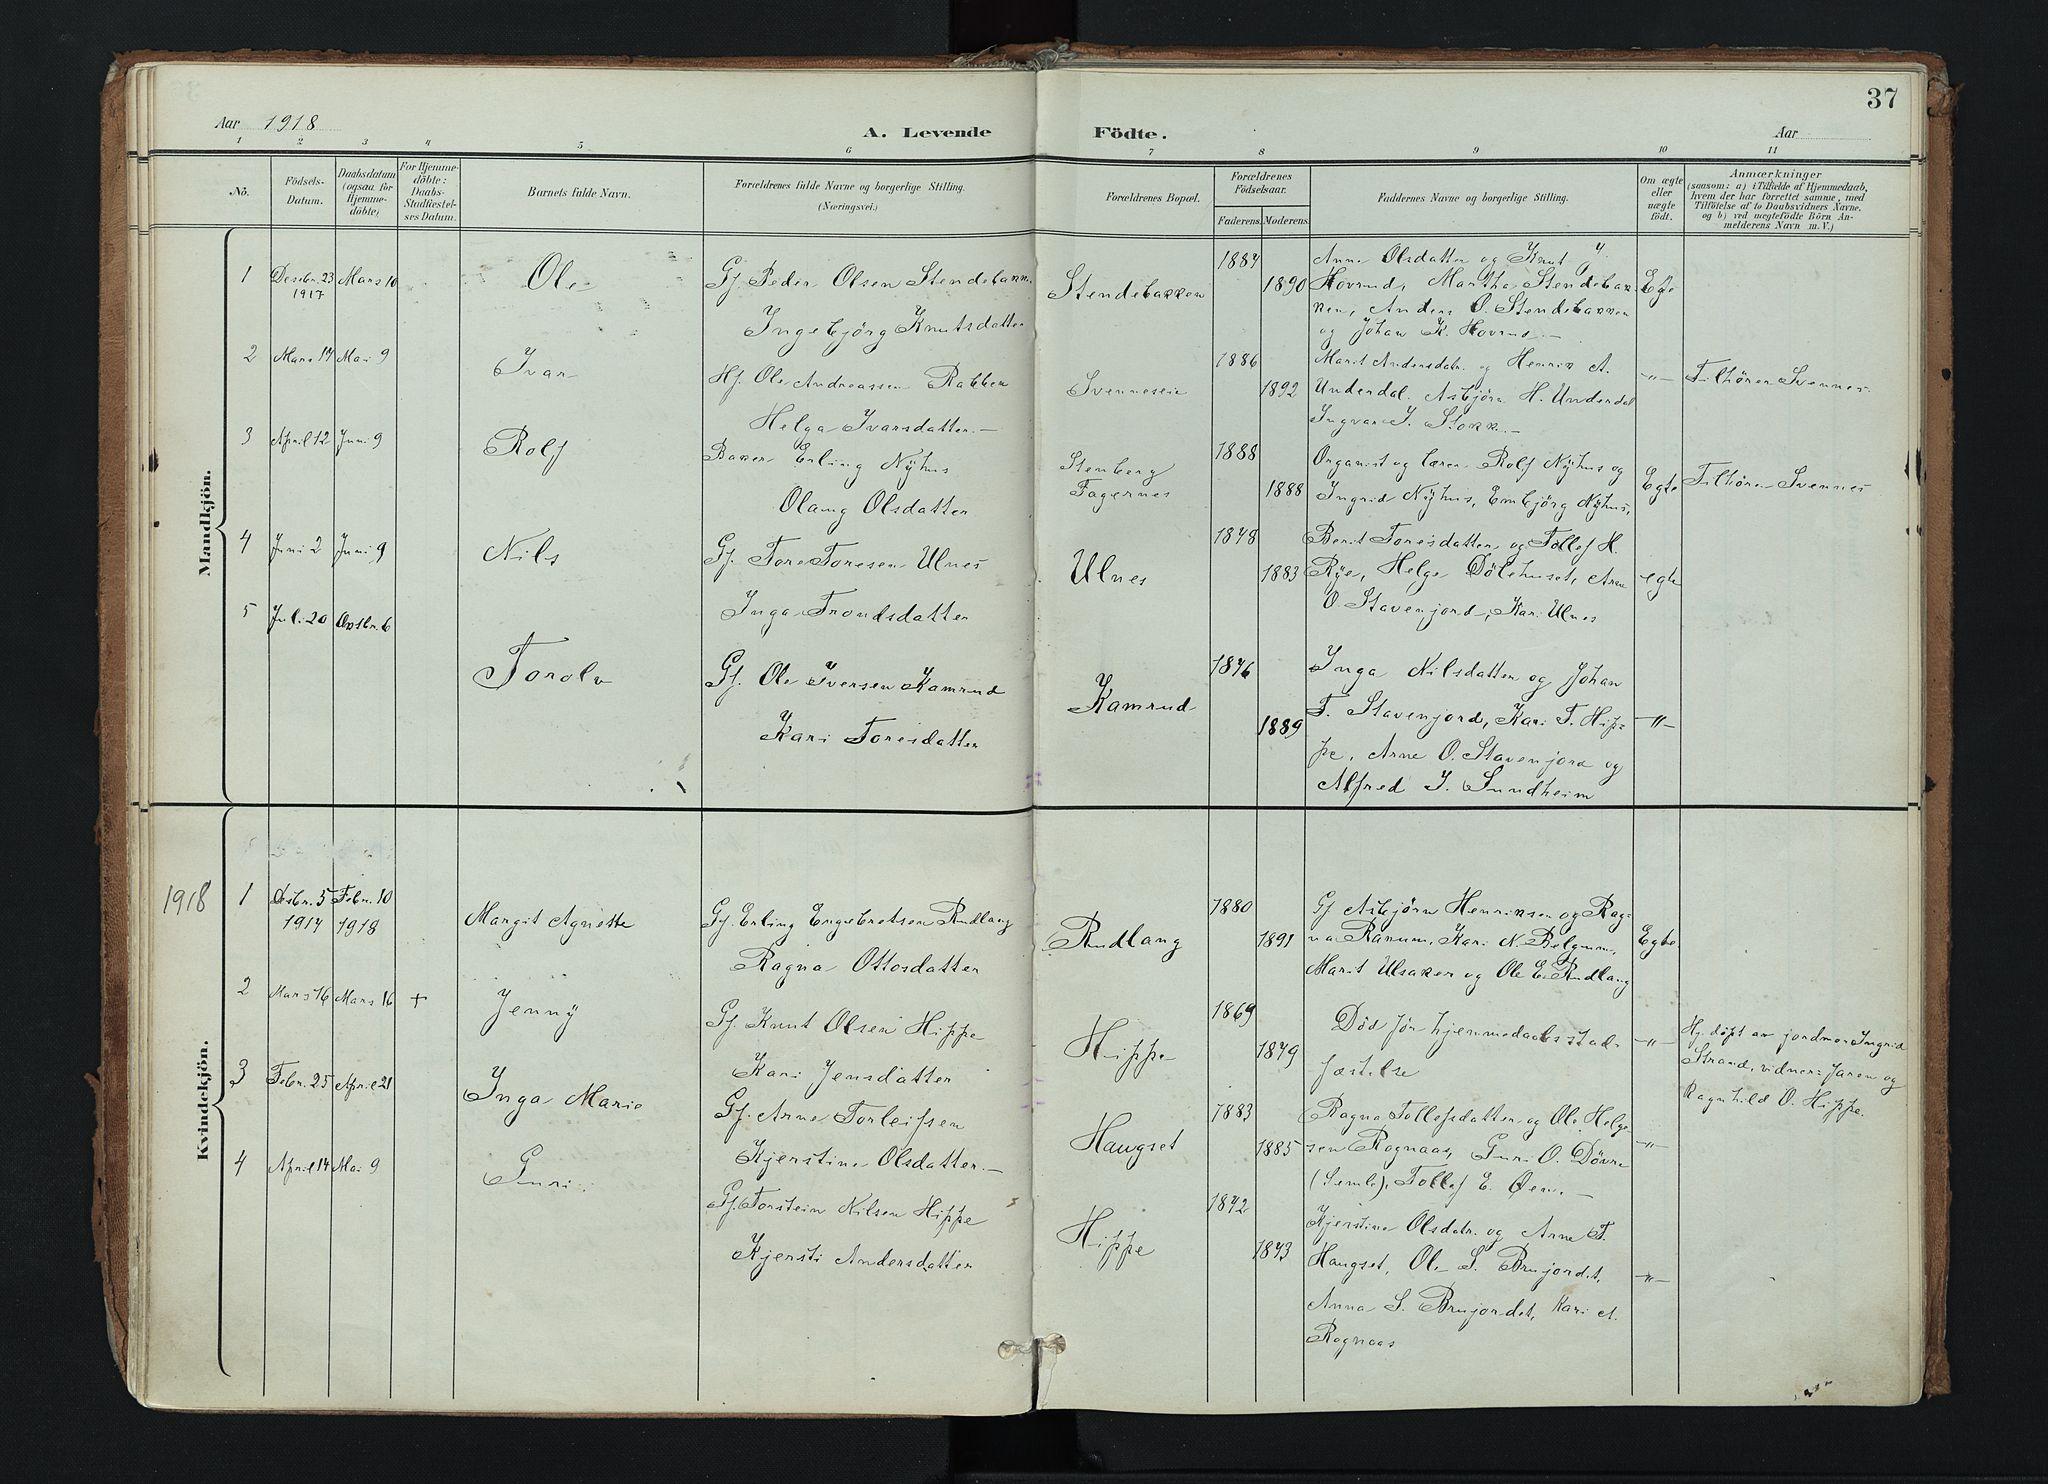 SAH, Nord-Aurdal prestekontor, Ministerialbok nr. 17, 1897-1926, s. 37